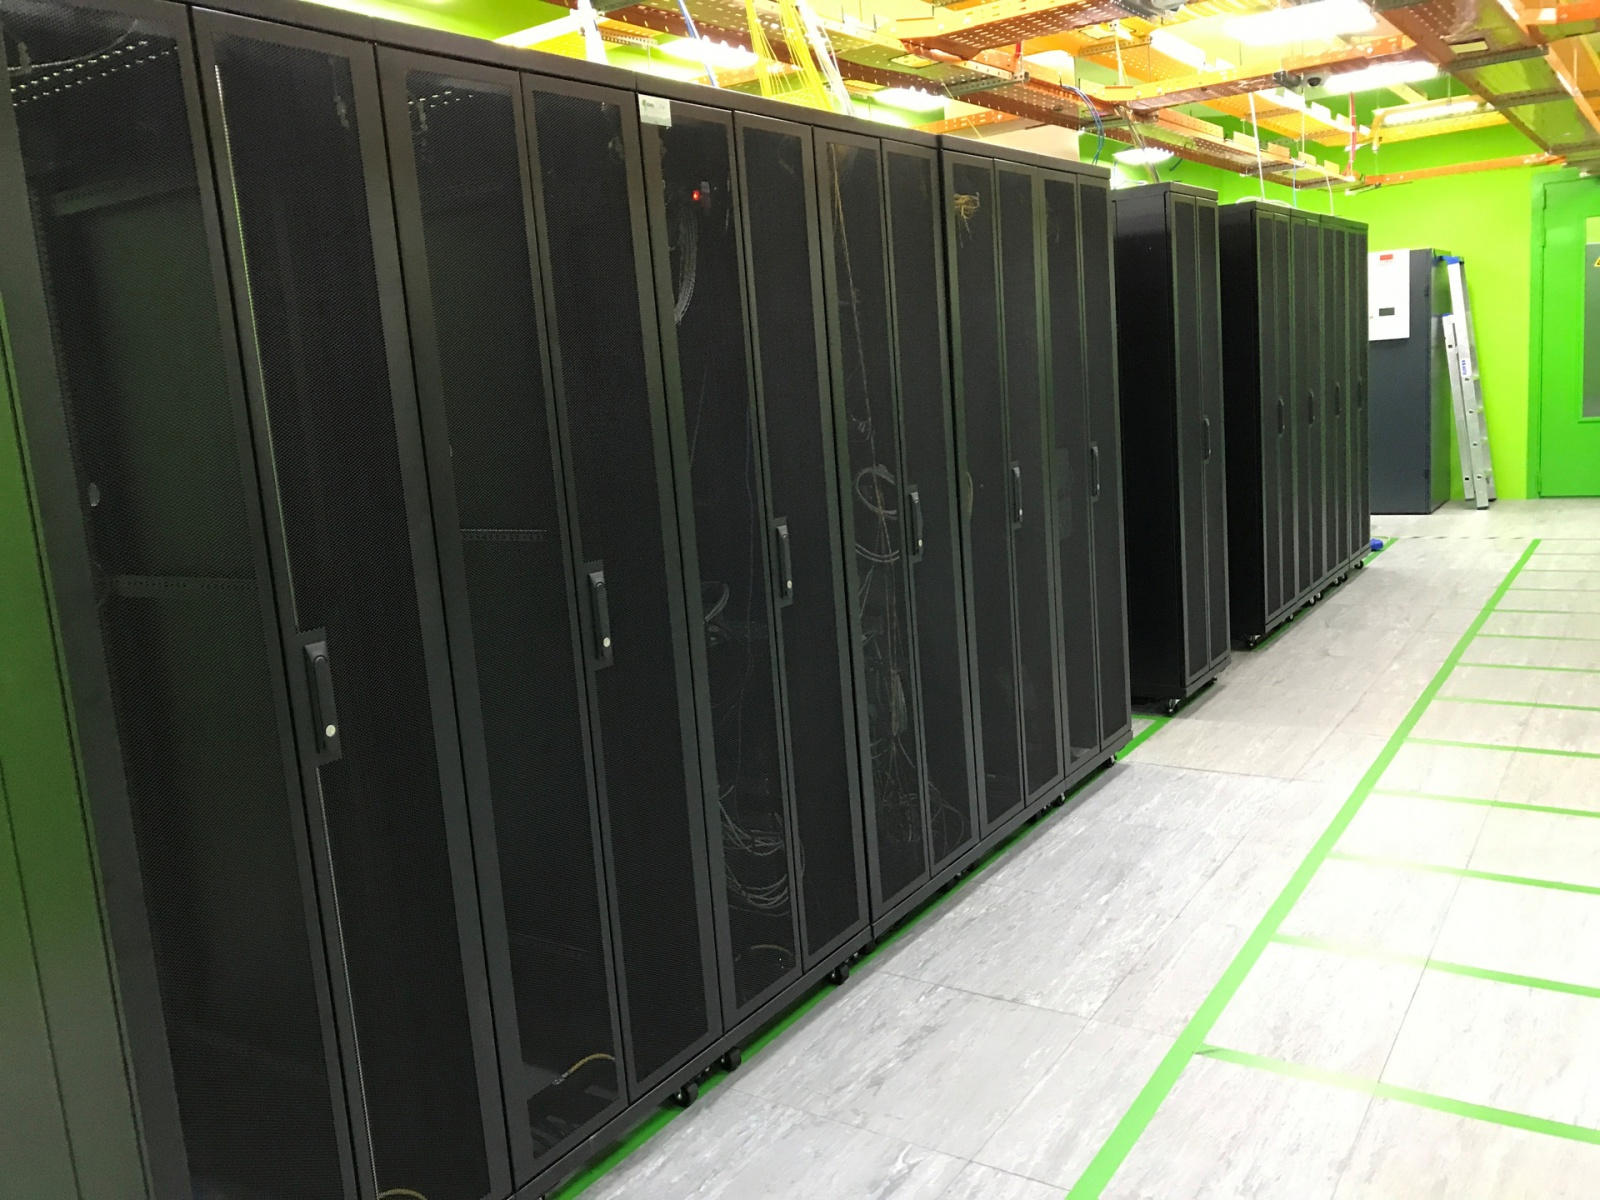 За какие заслуги Kingston любят центры обработки данных? Рассказывает 3data - 7